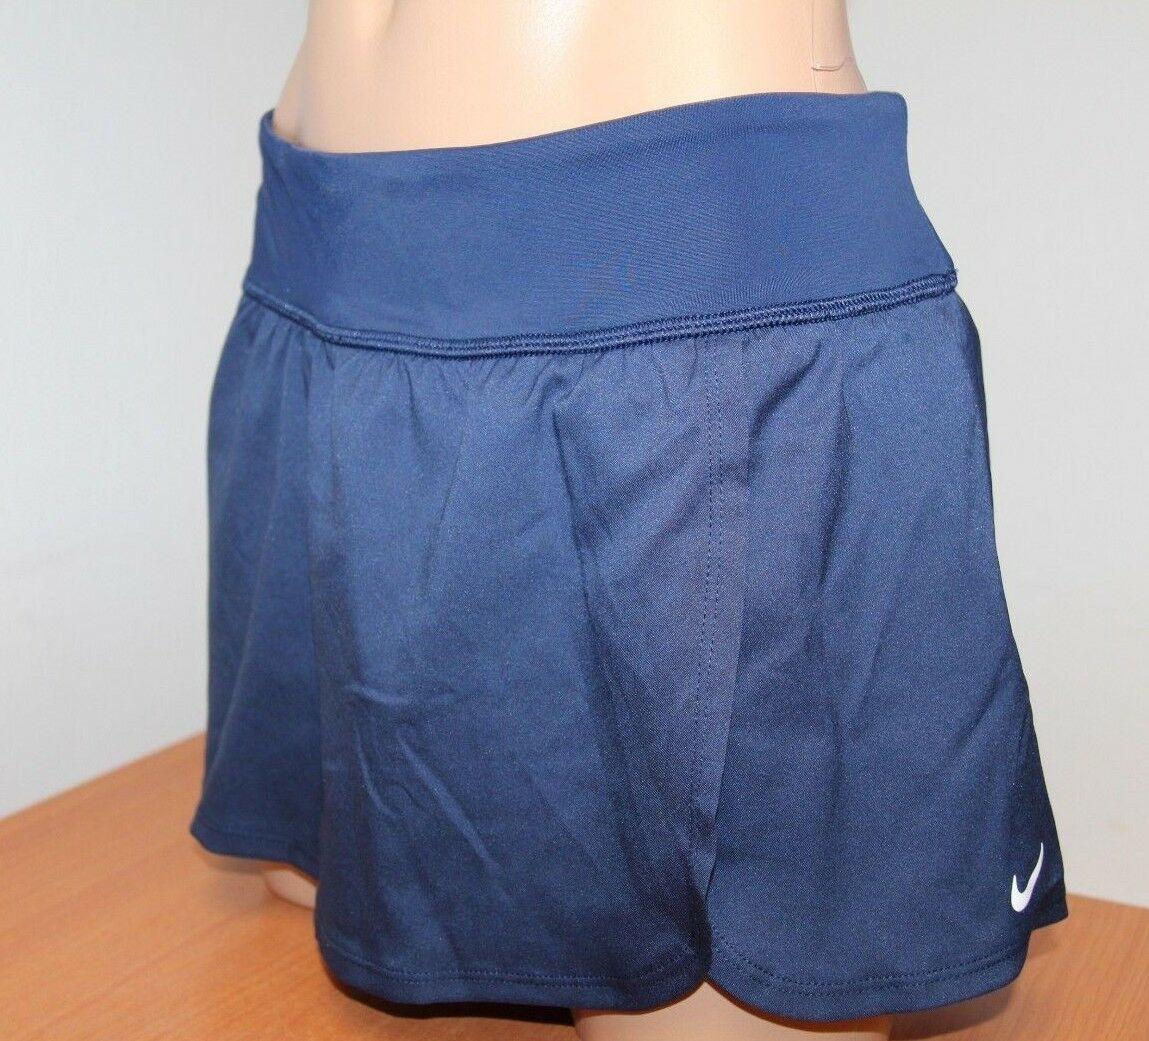 New Nike Swimsuit Bikini Skirted Bottom Skirt Midnight Navy Size L